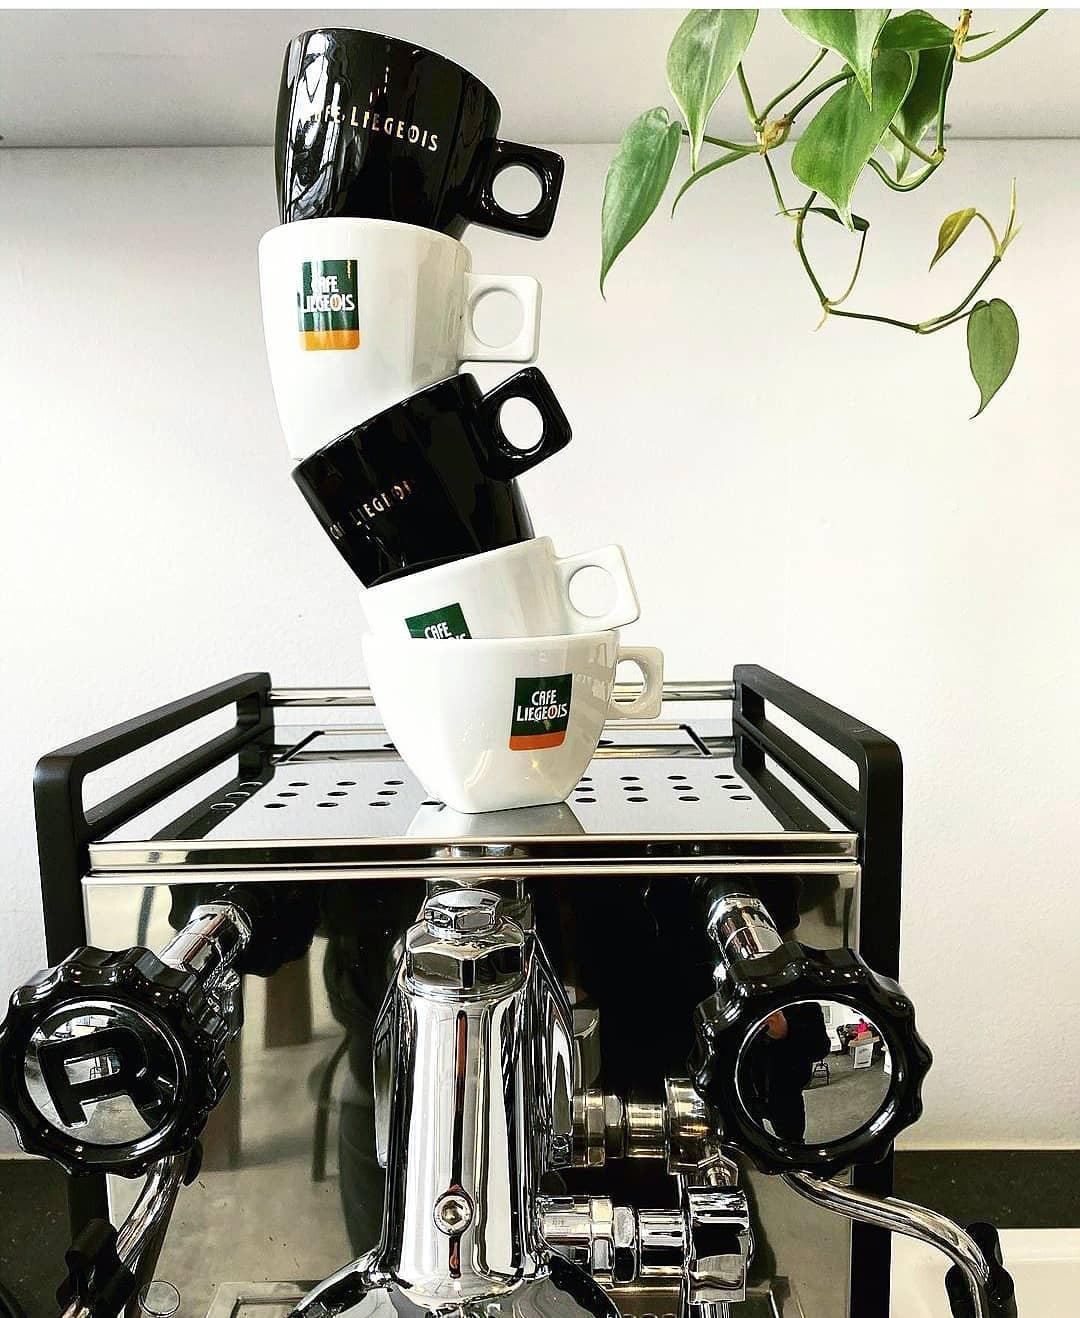 Кофе_Лежуа_Cafe_Liegeois